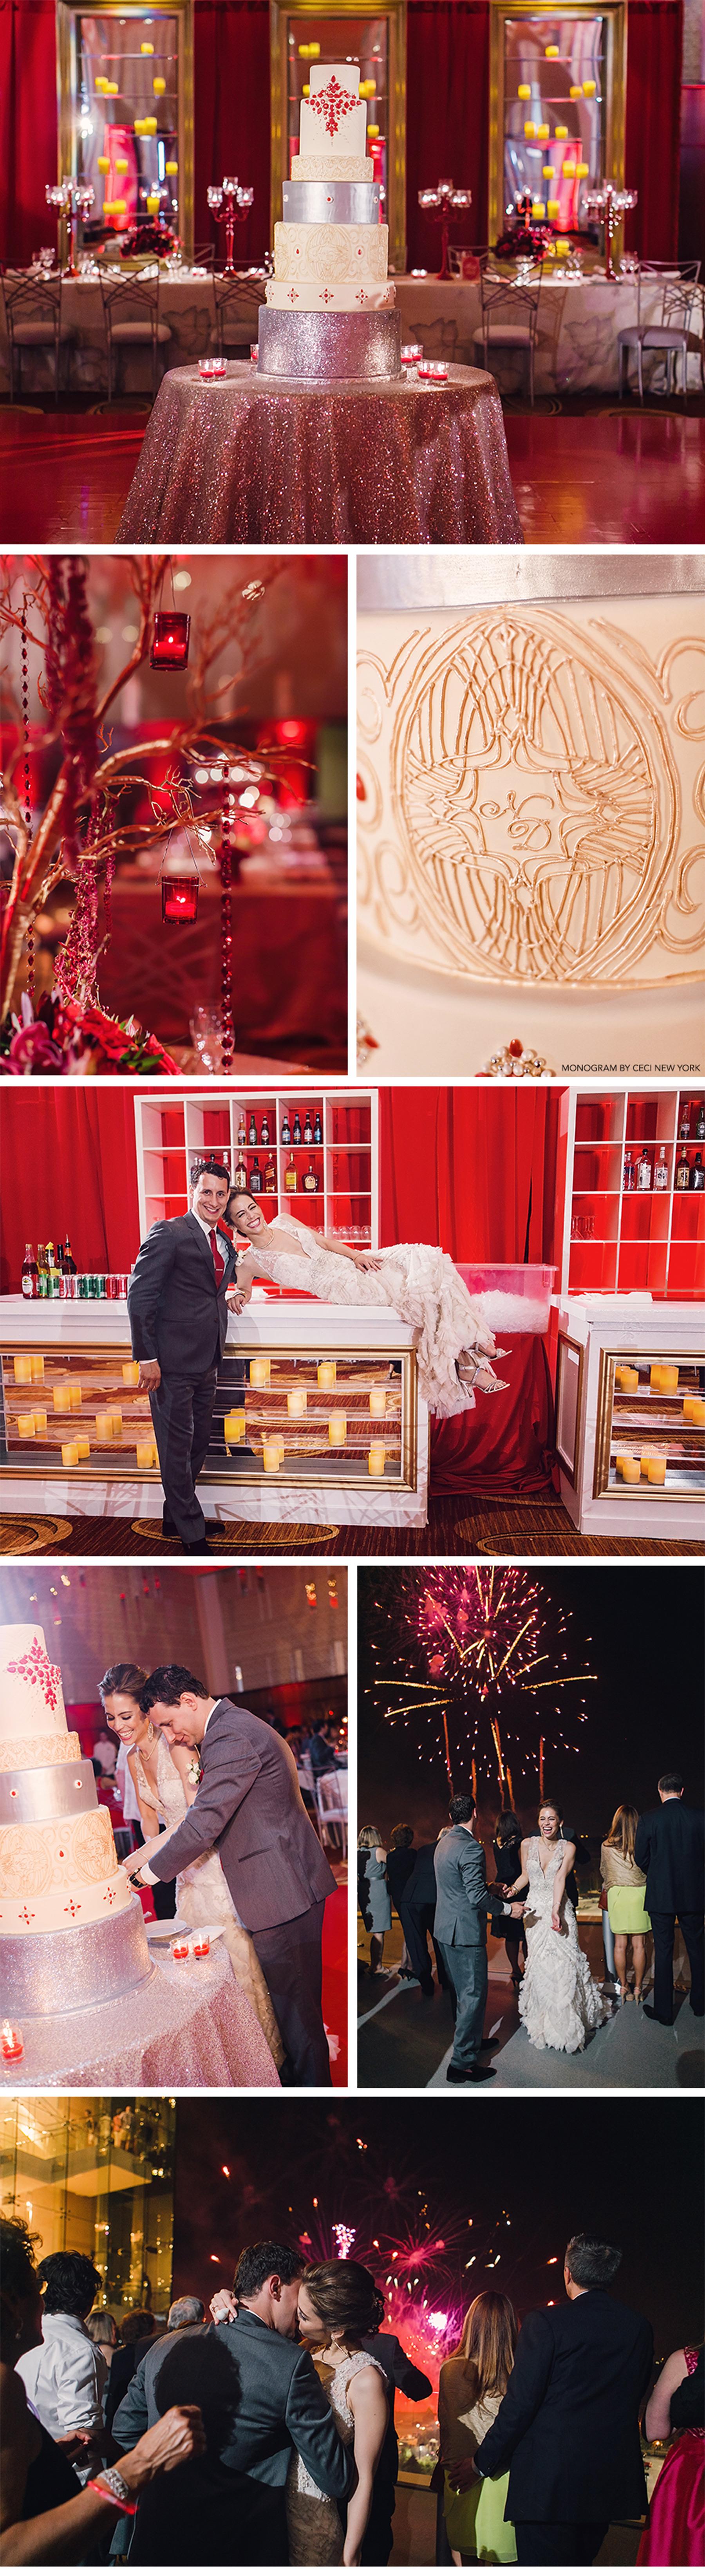 Louis Wedding Show Youtube Bride 77